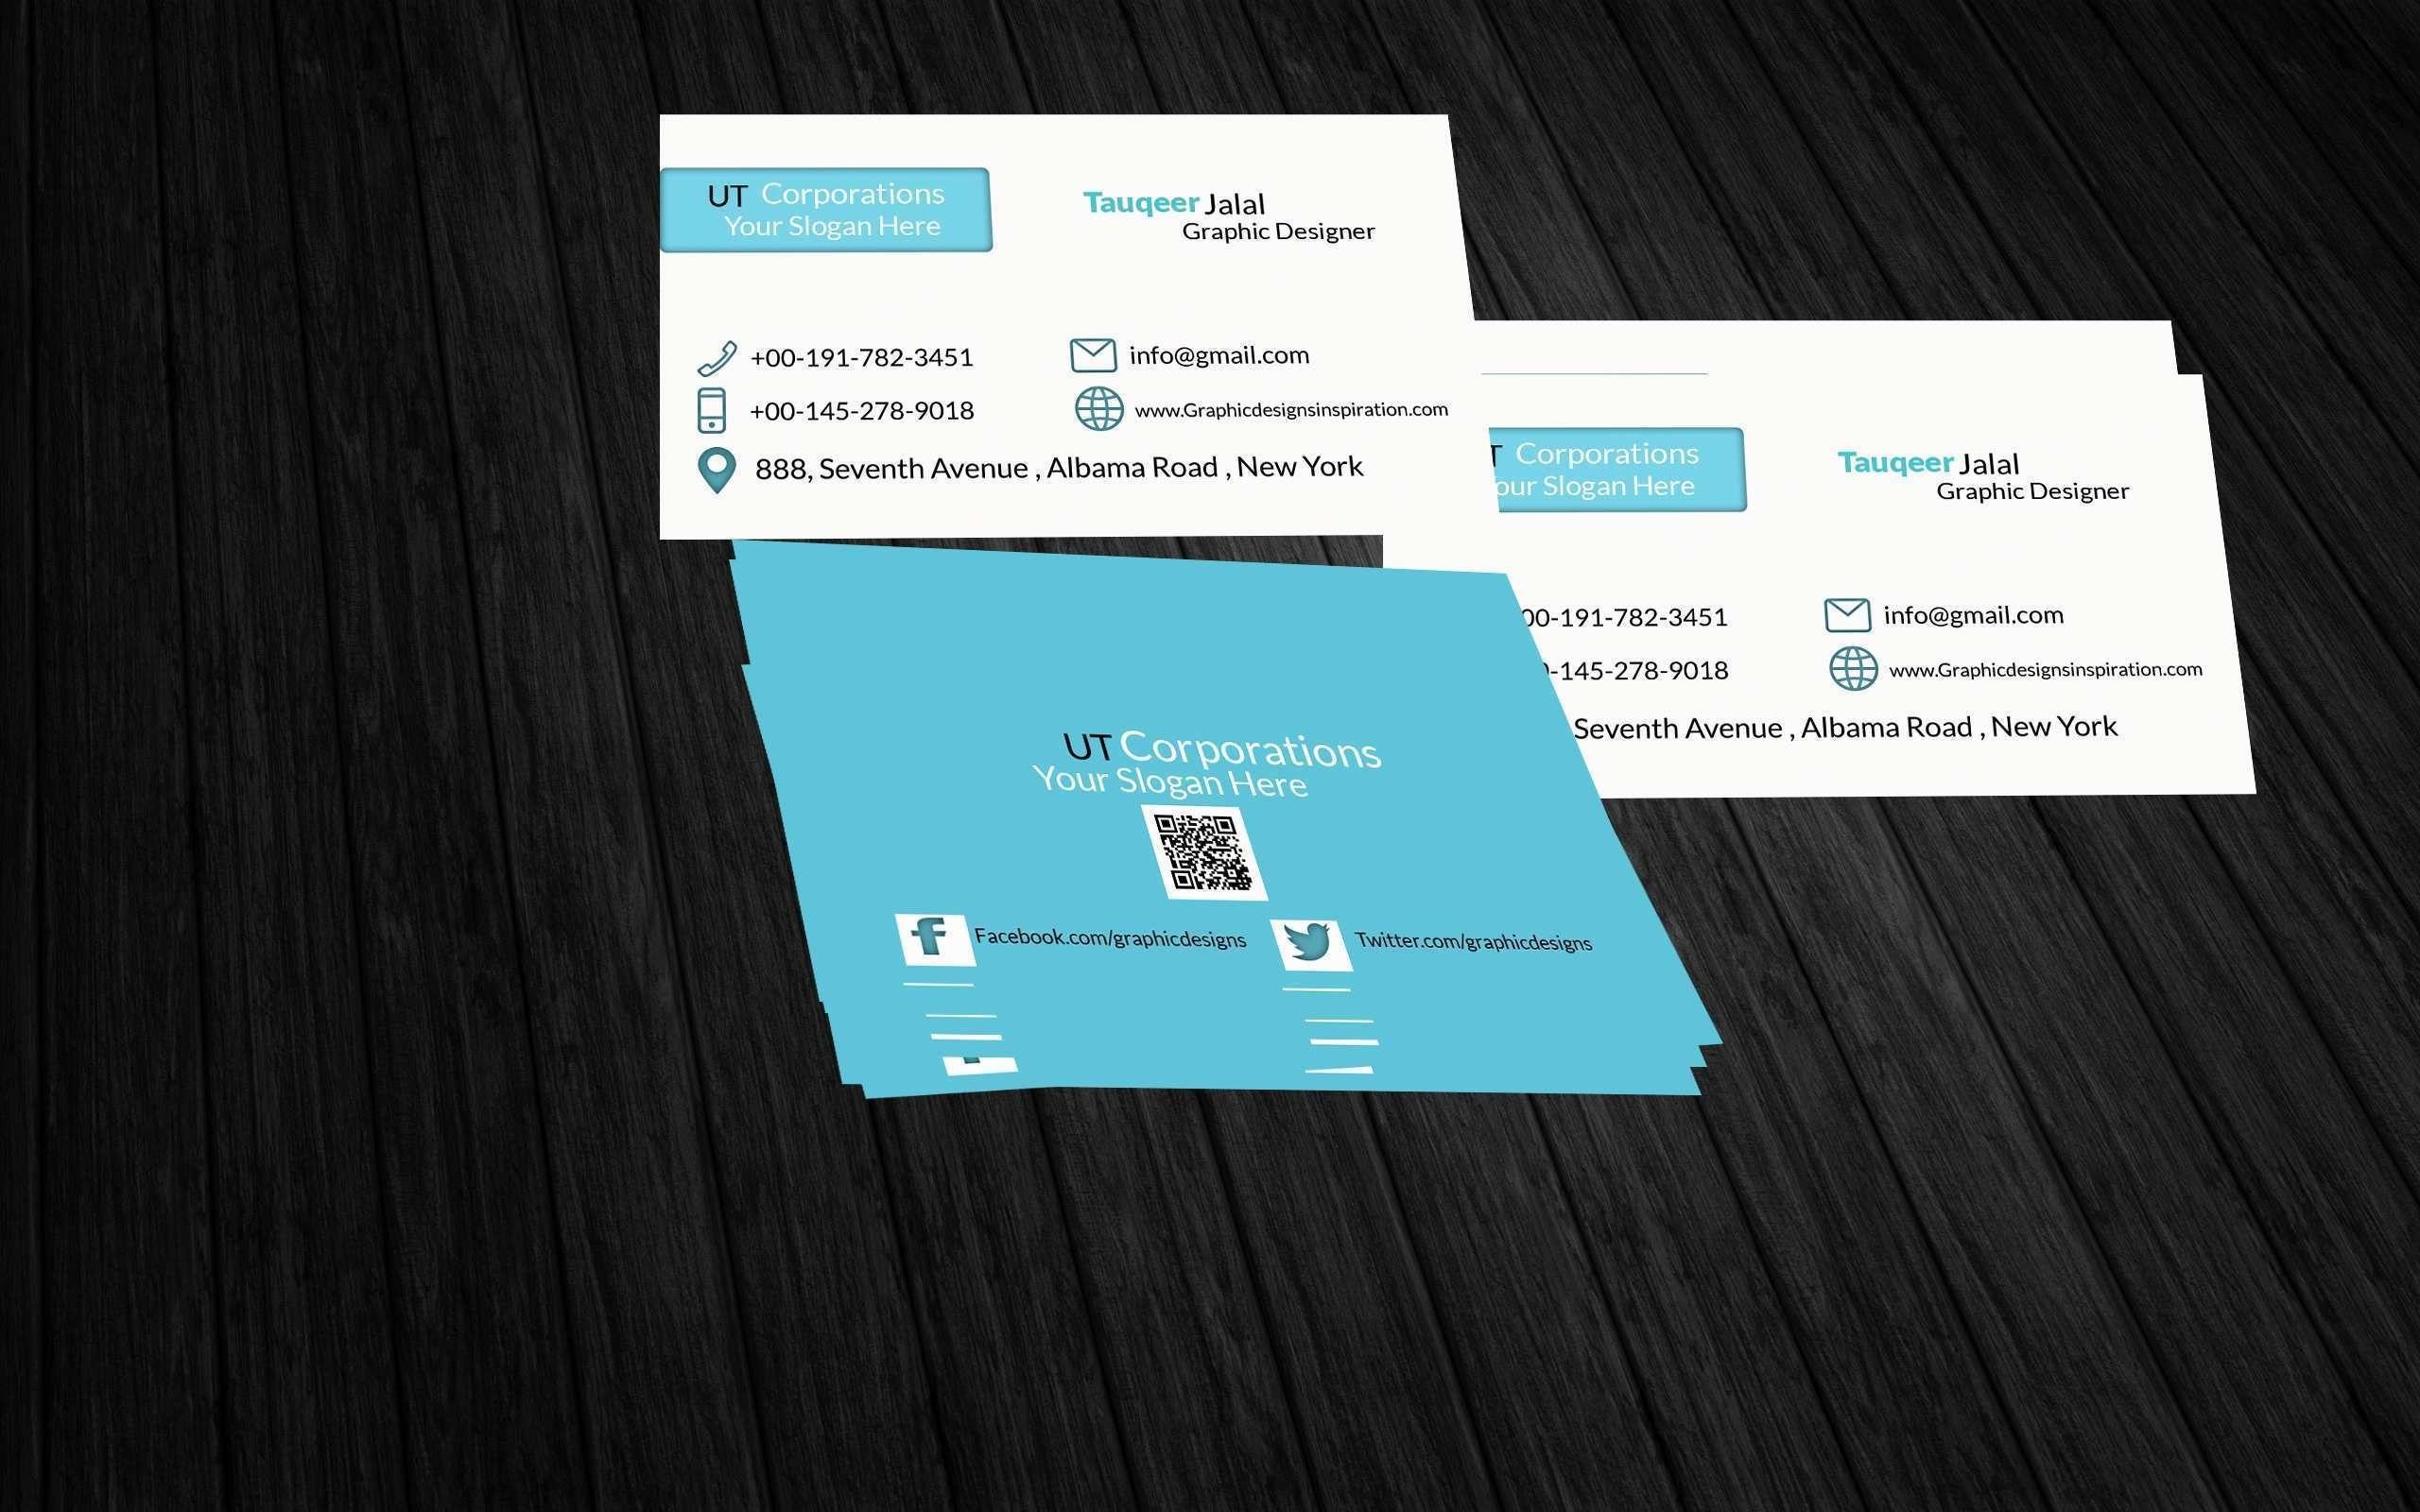 Online Business Card Maker Free Printable Beautiful Business Card - Online Business Card Maker Free Printable